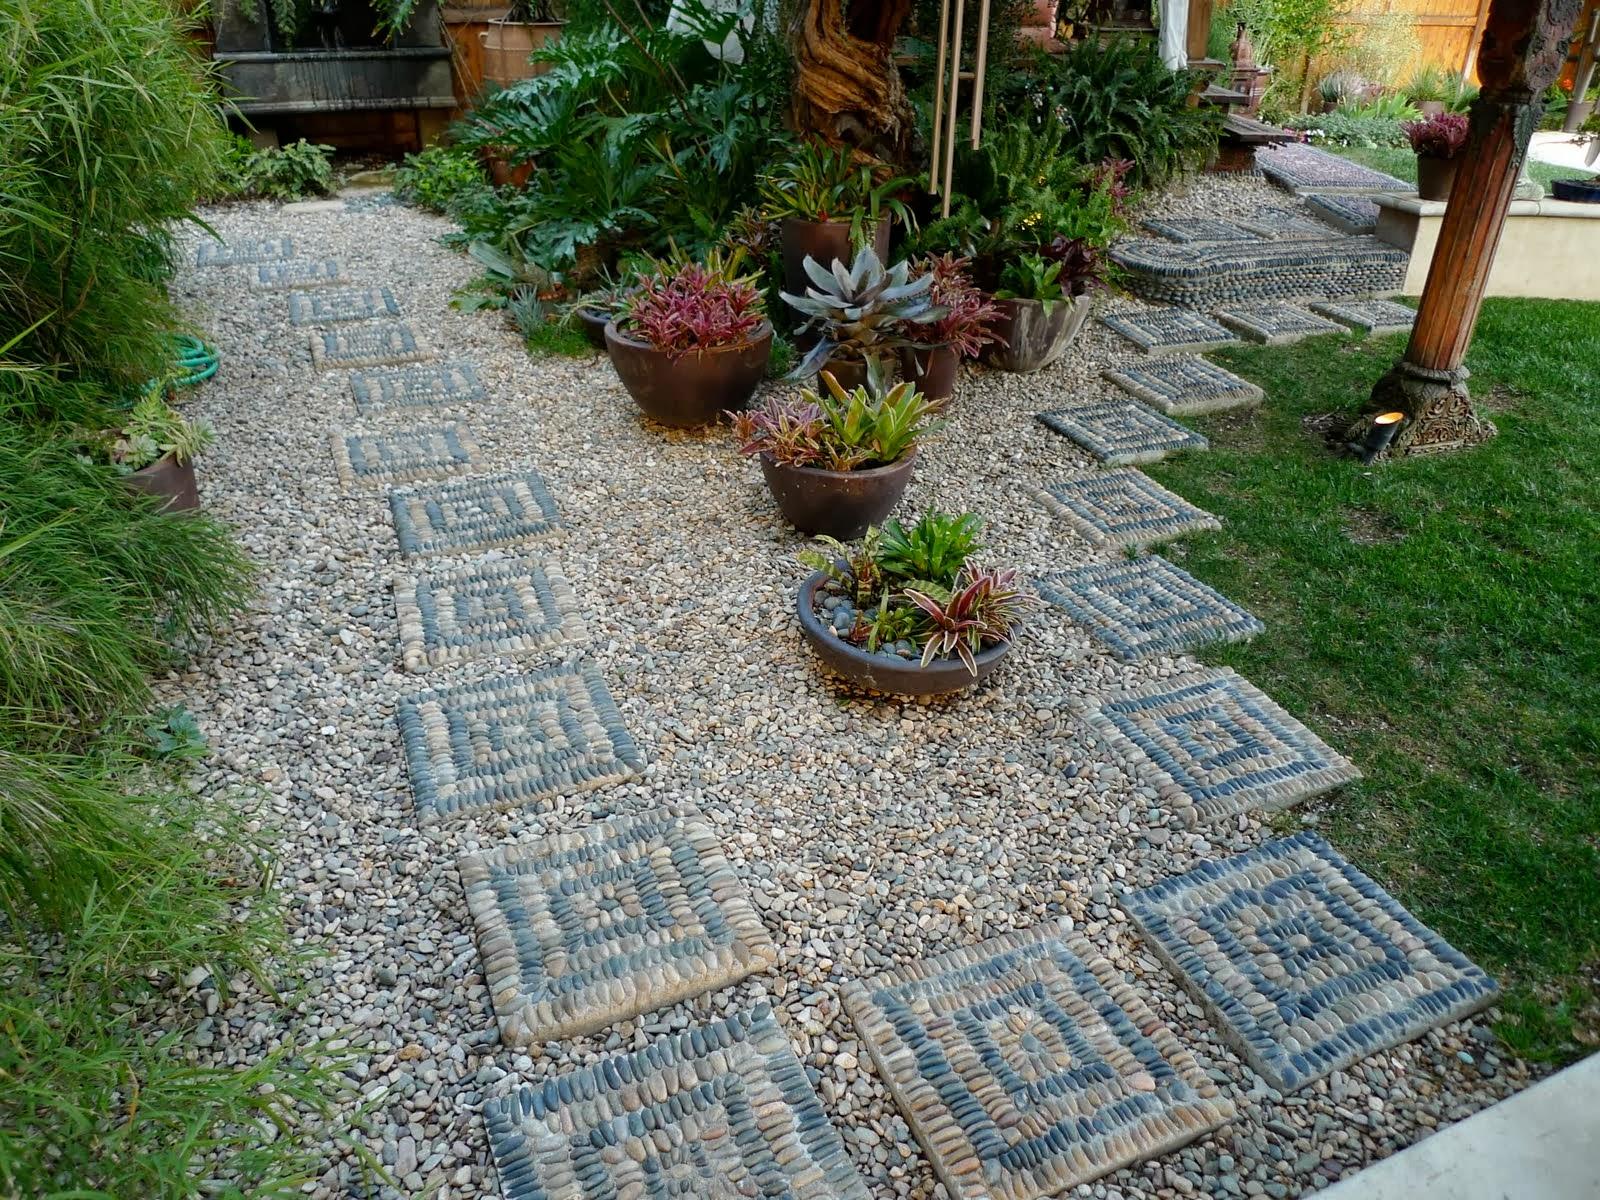 garden design ideas with stones photo - 9